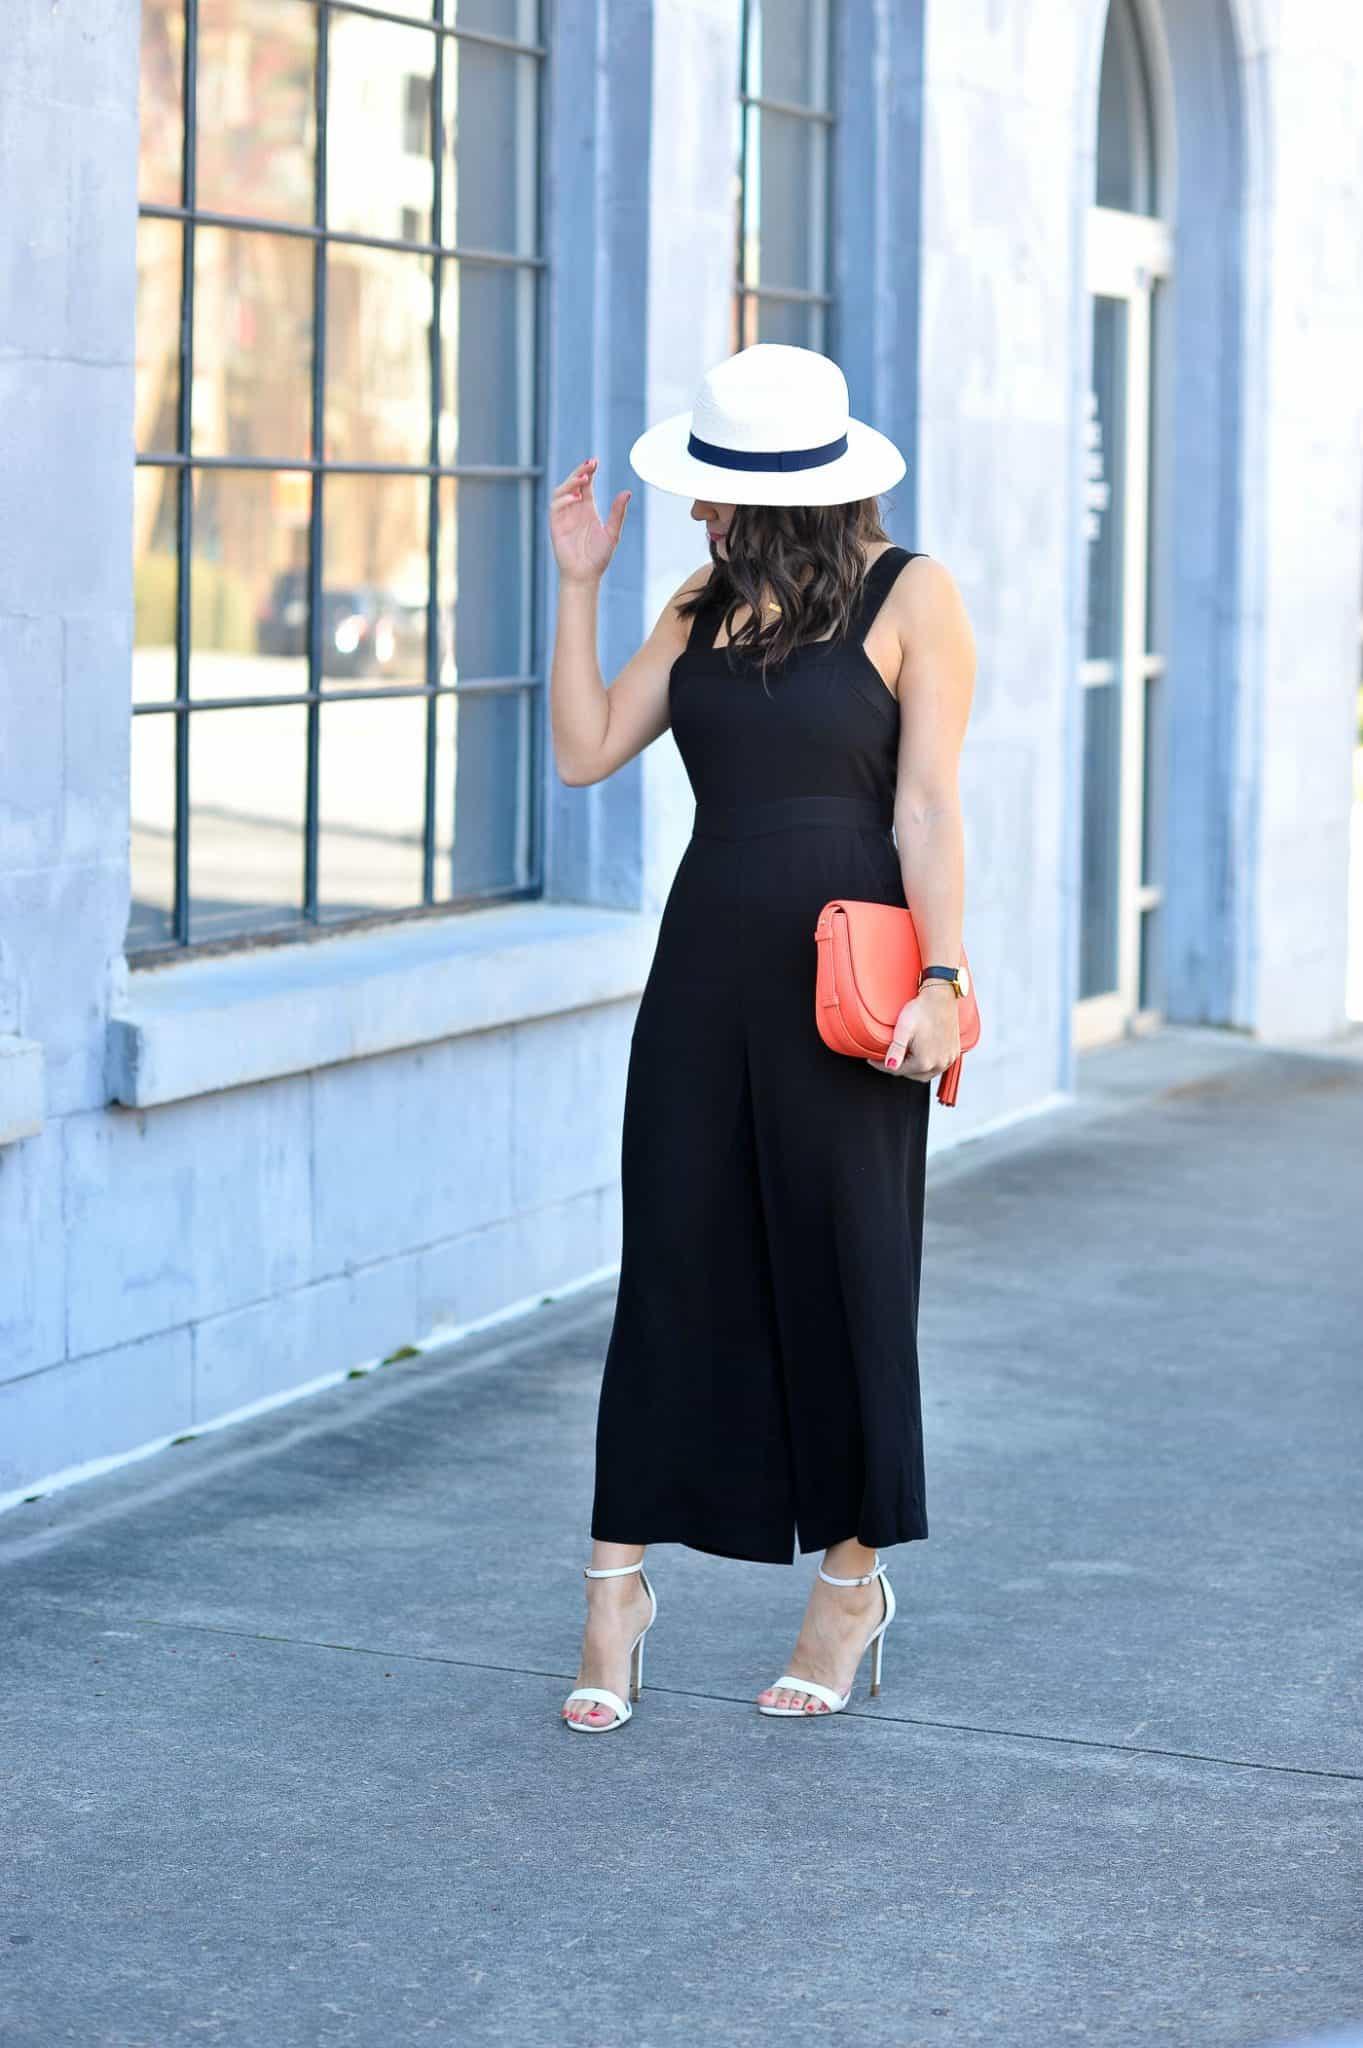 My Style Vita styling a jumpsuit